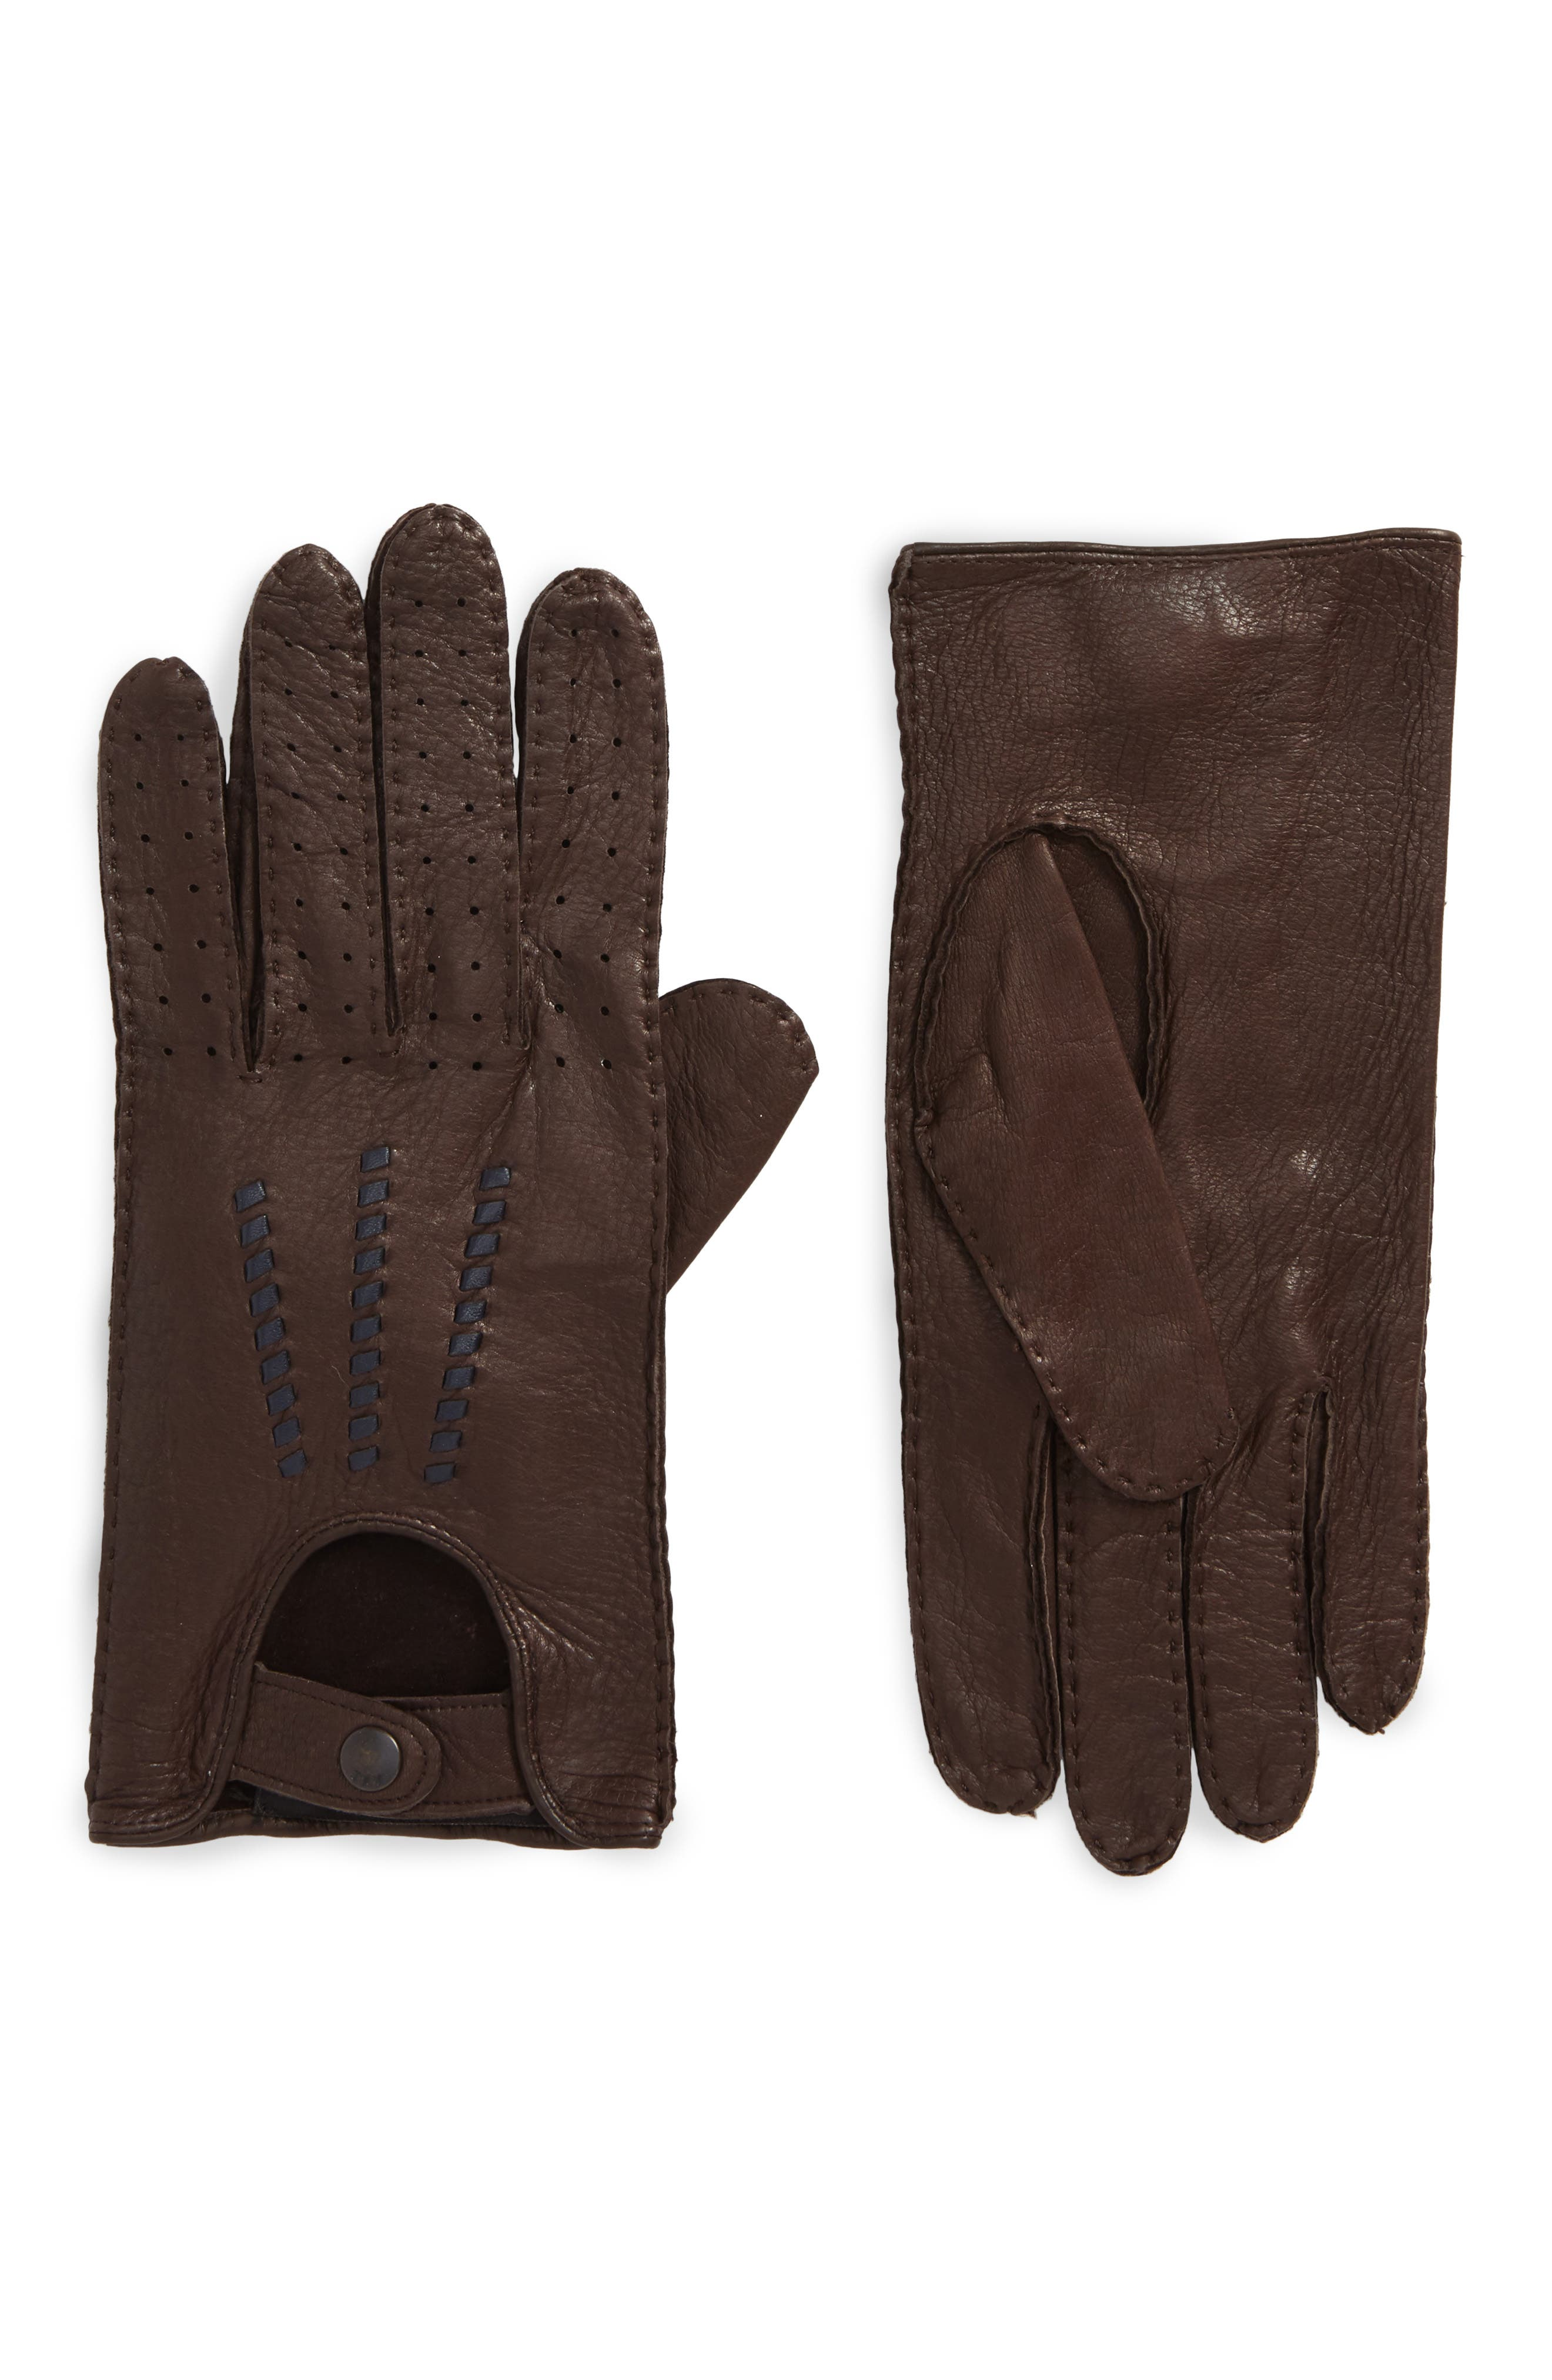 Deerskin Driving Gloves,                         Main,                         color, Chocolate